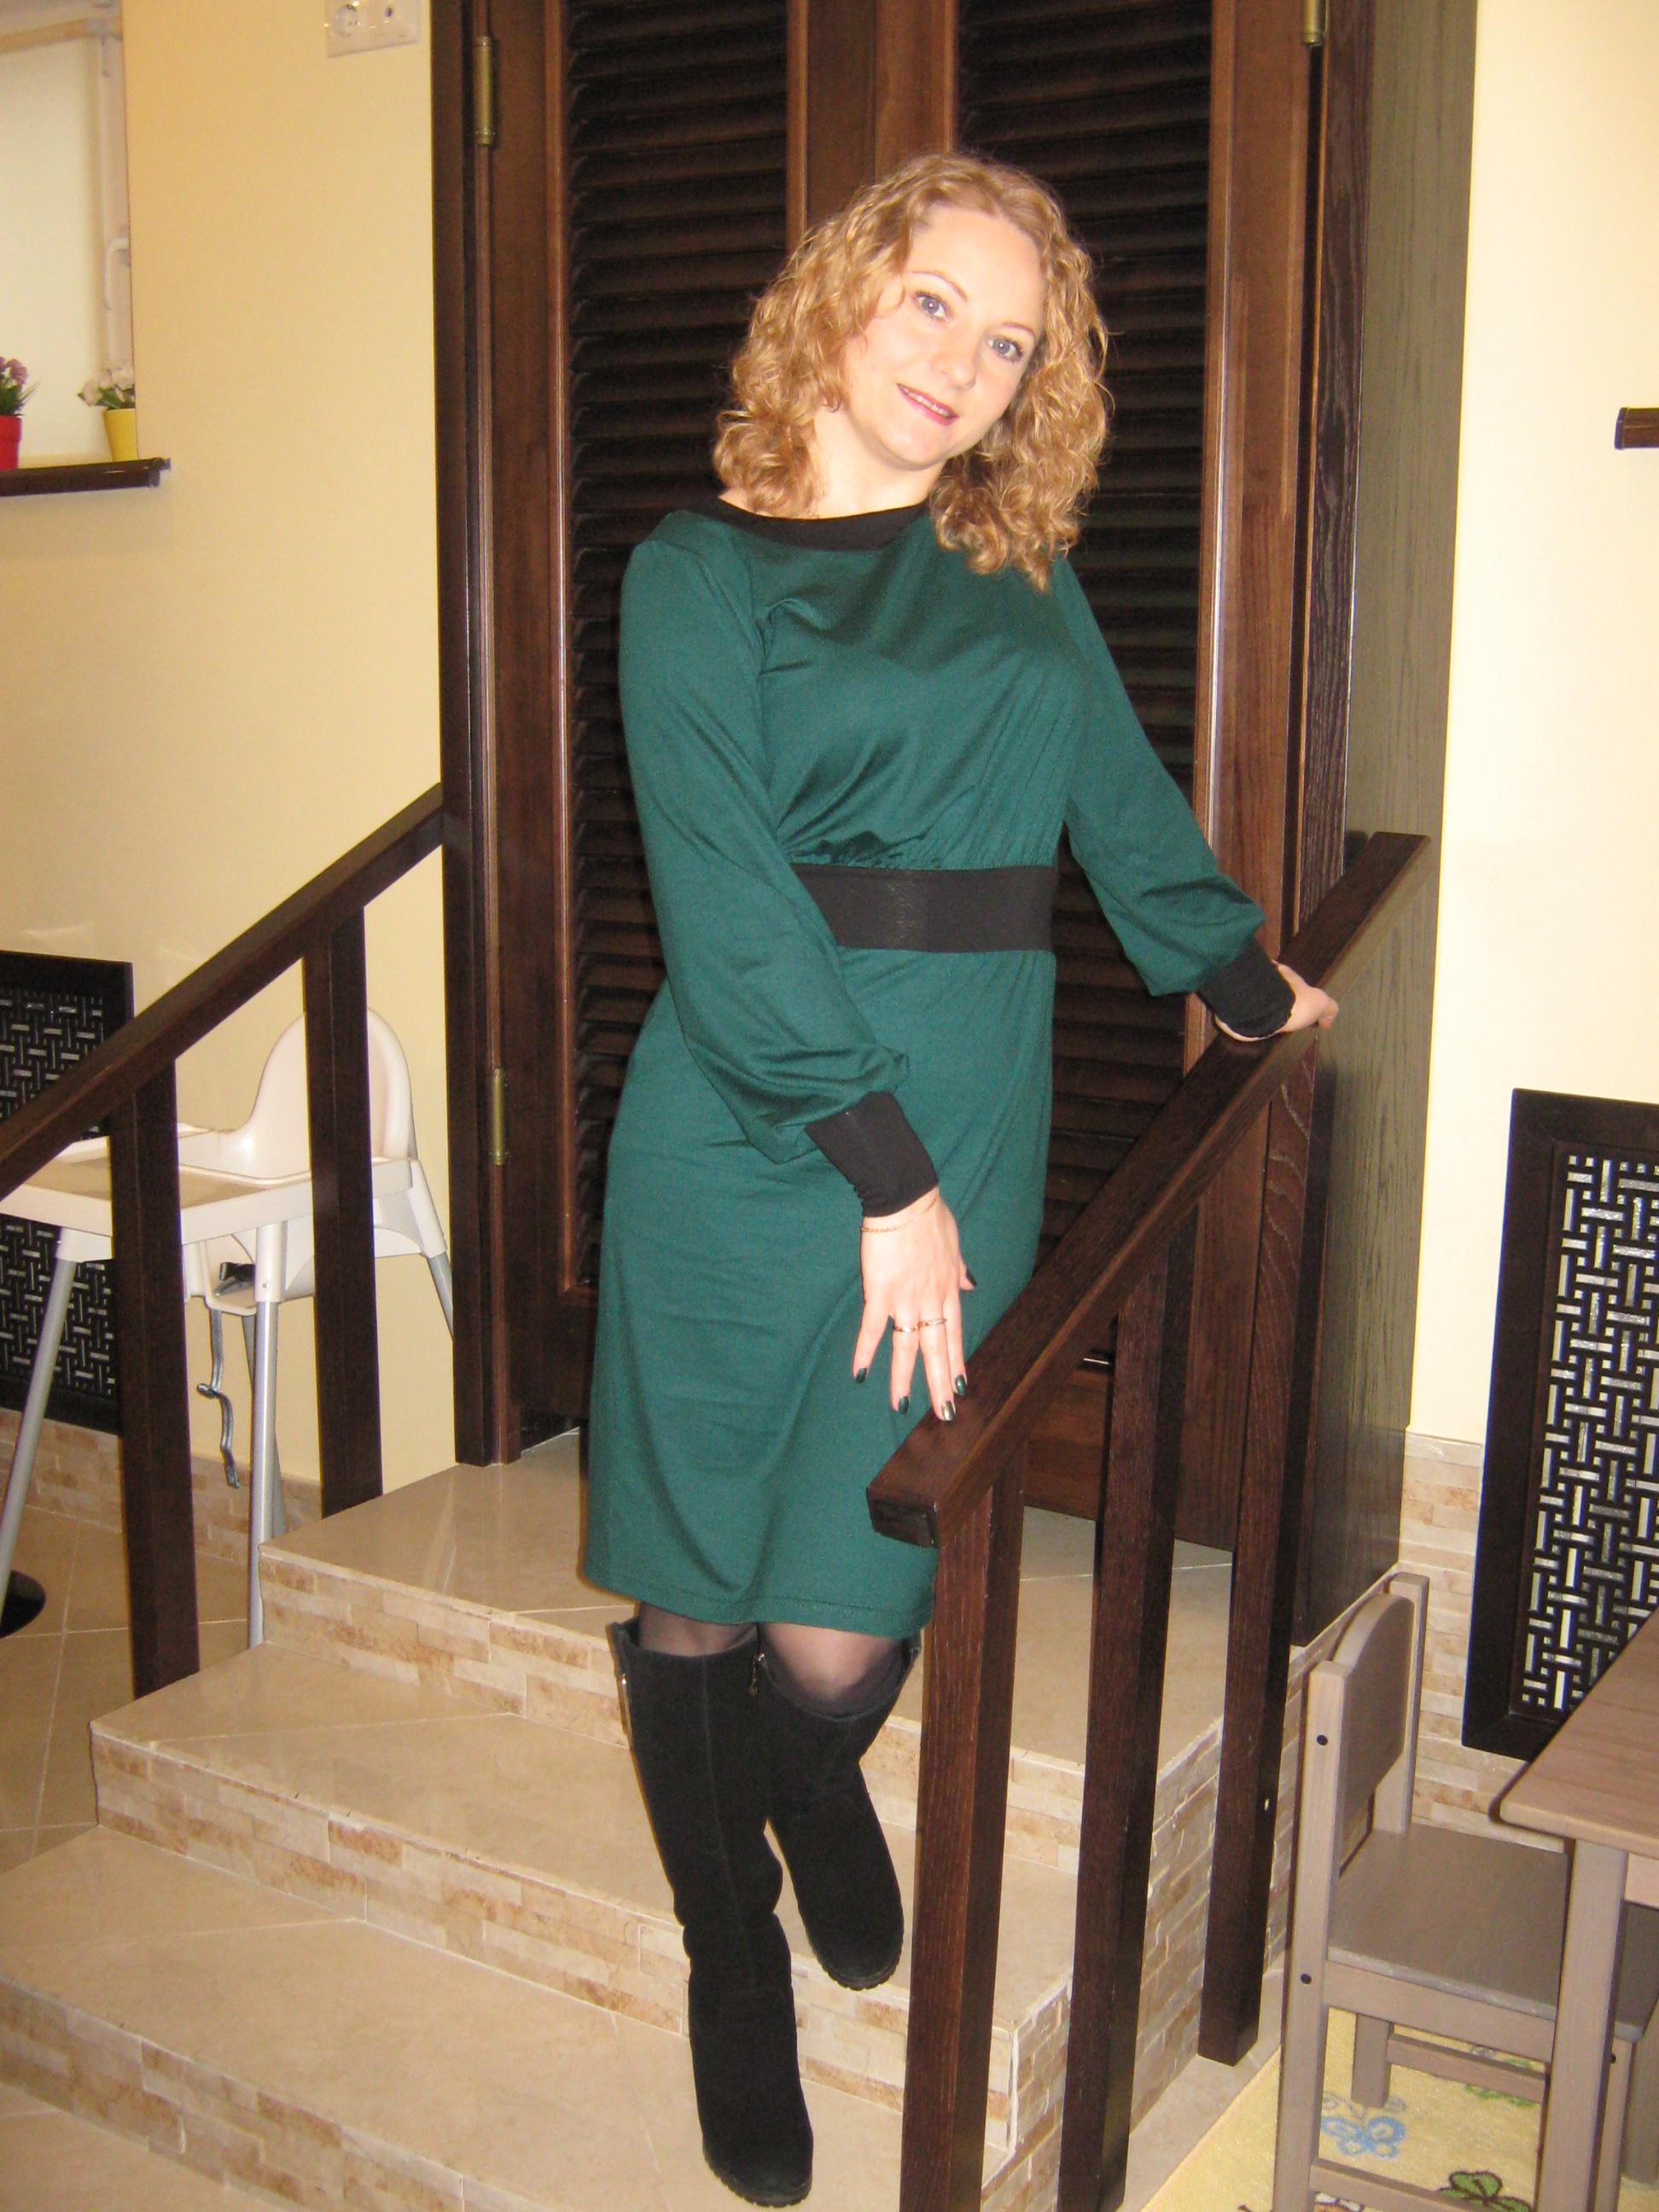 Серебряная ладья платья фото